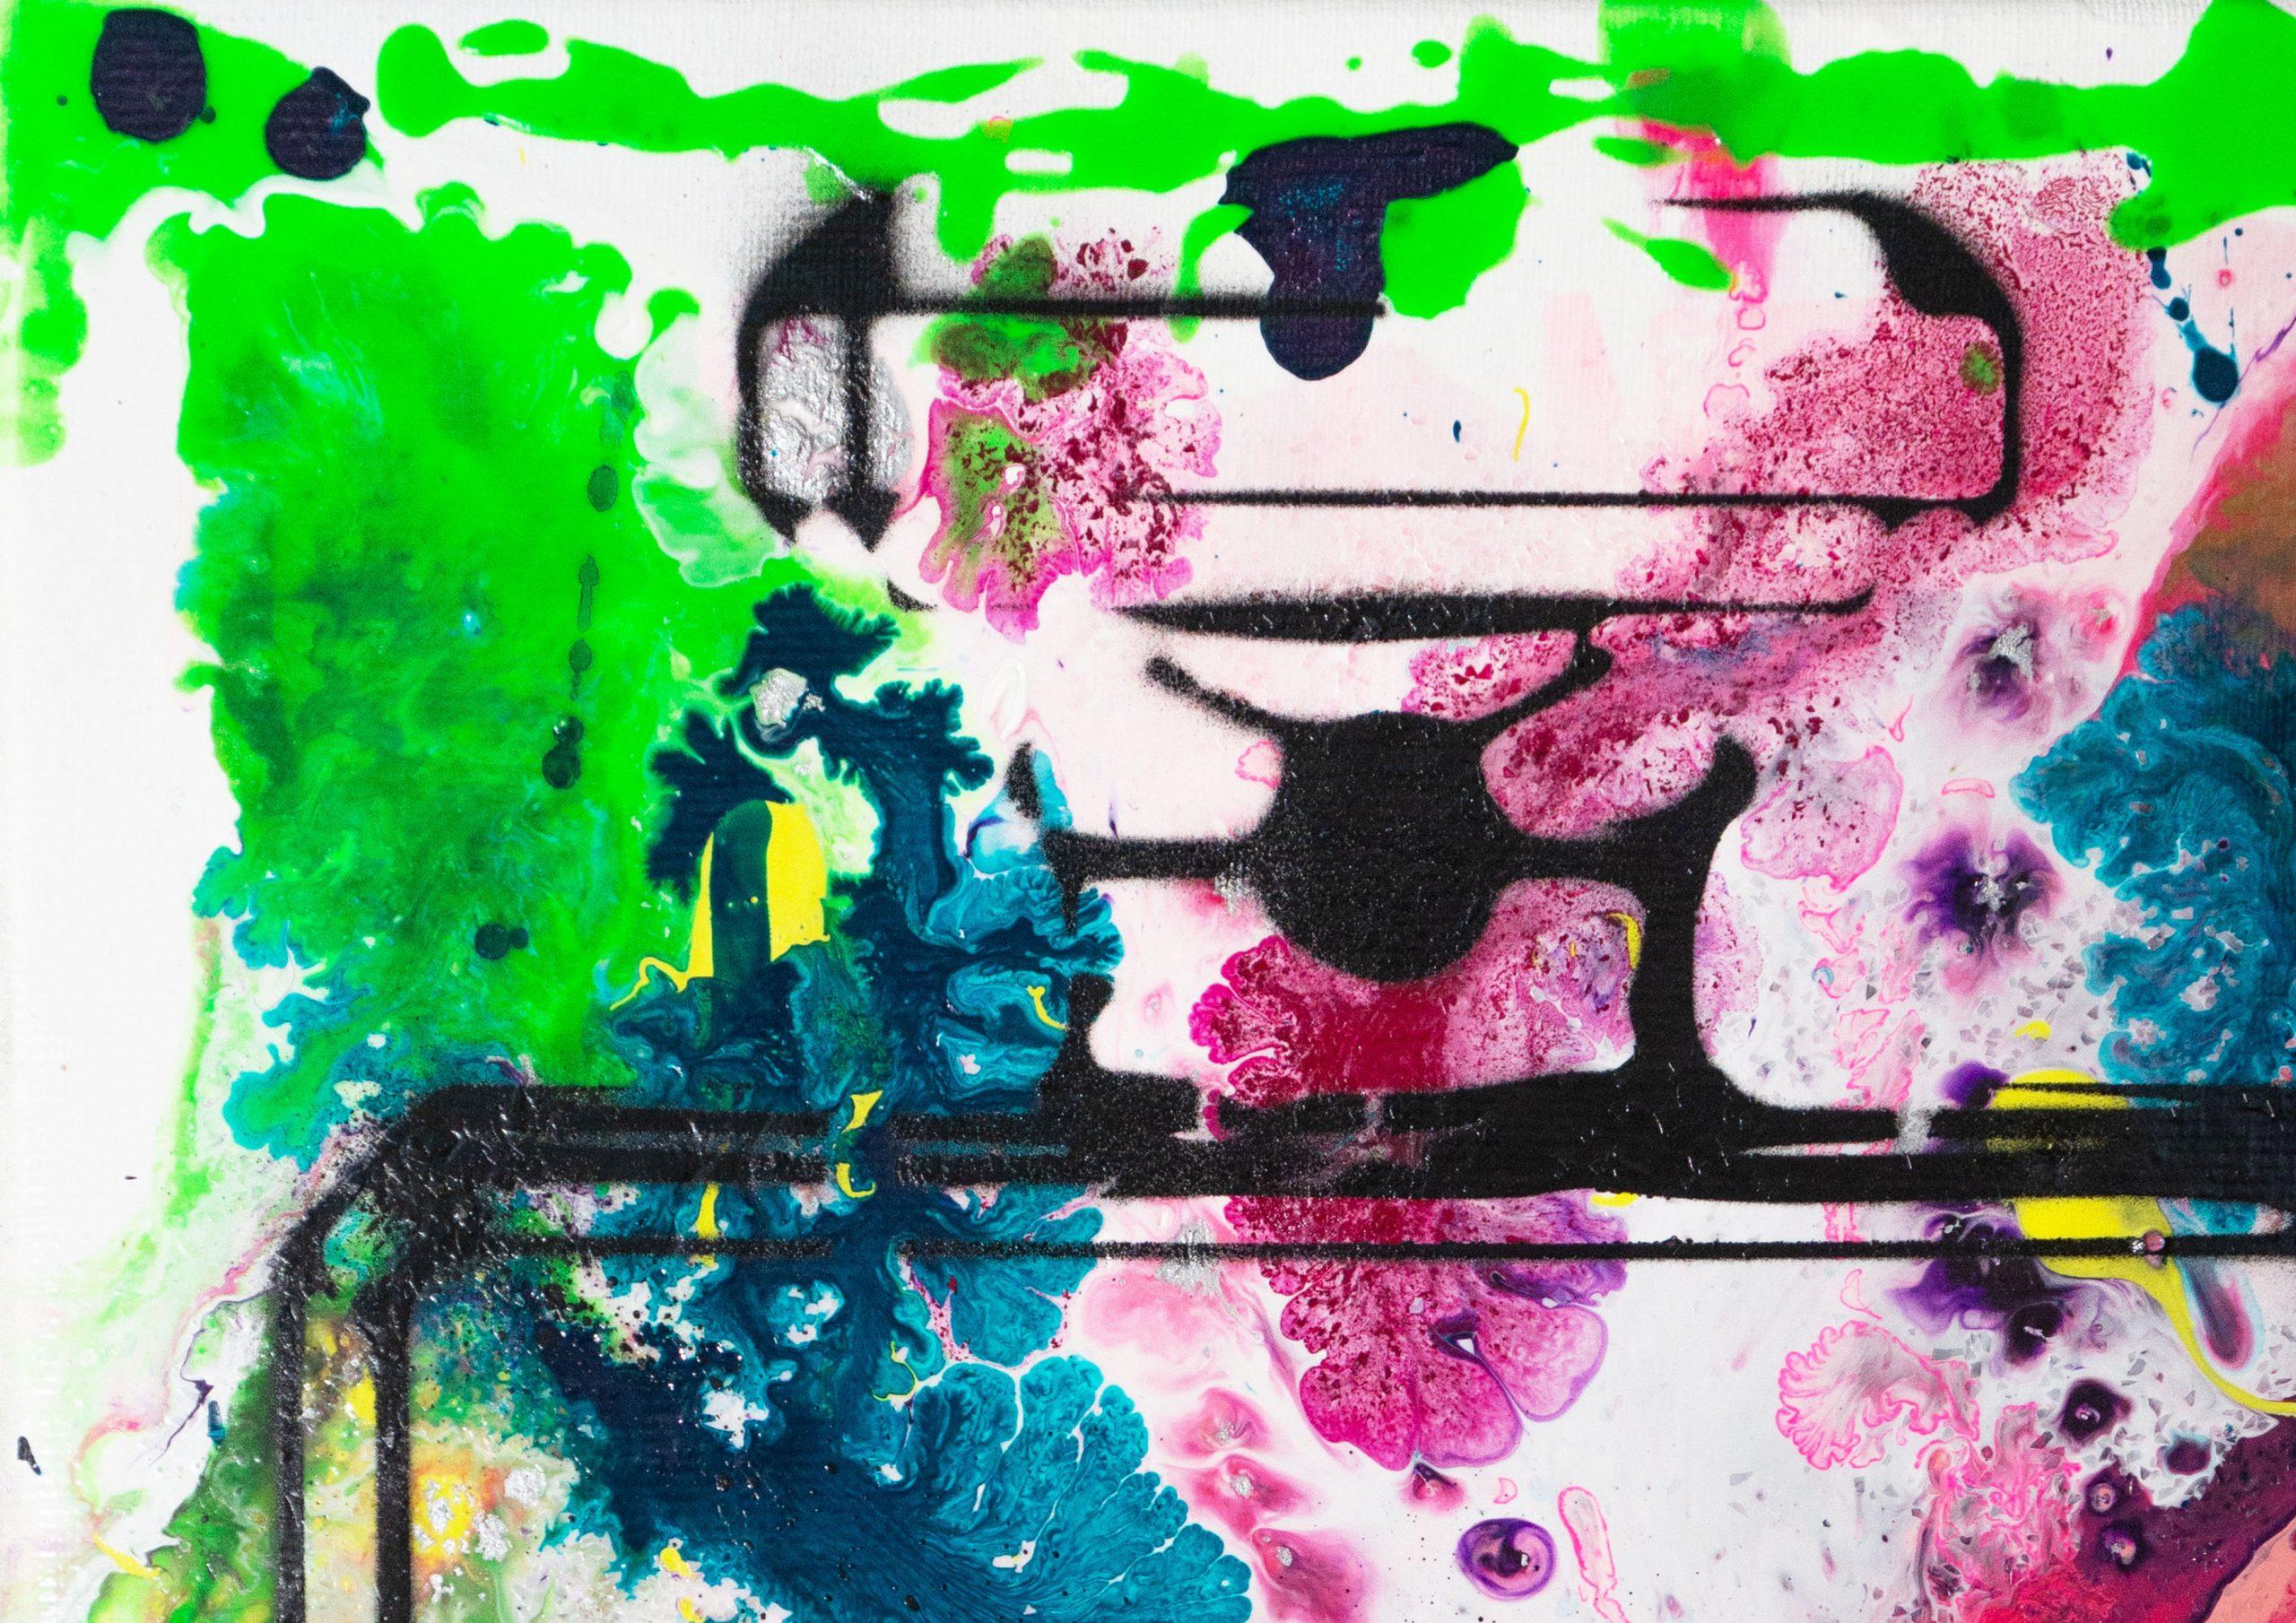 ART-PAINT-CHANEL-PERFUME-BOTANICAL-CANVAS-DETAIL-2